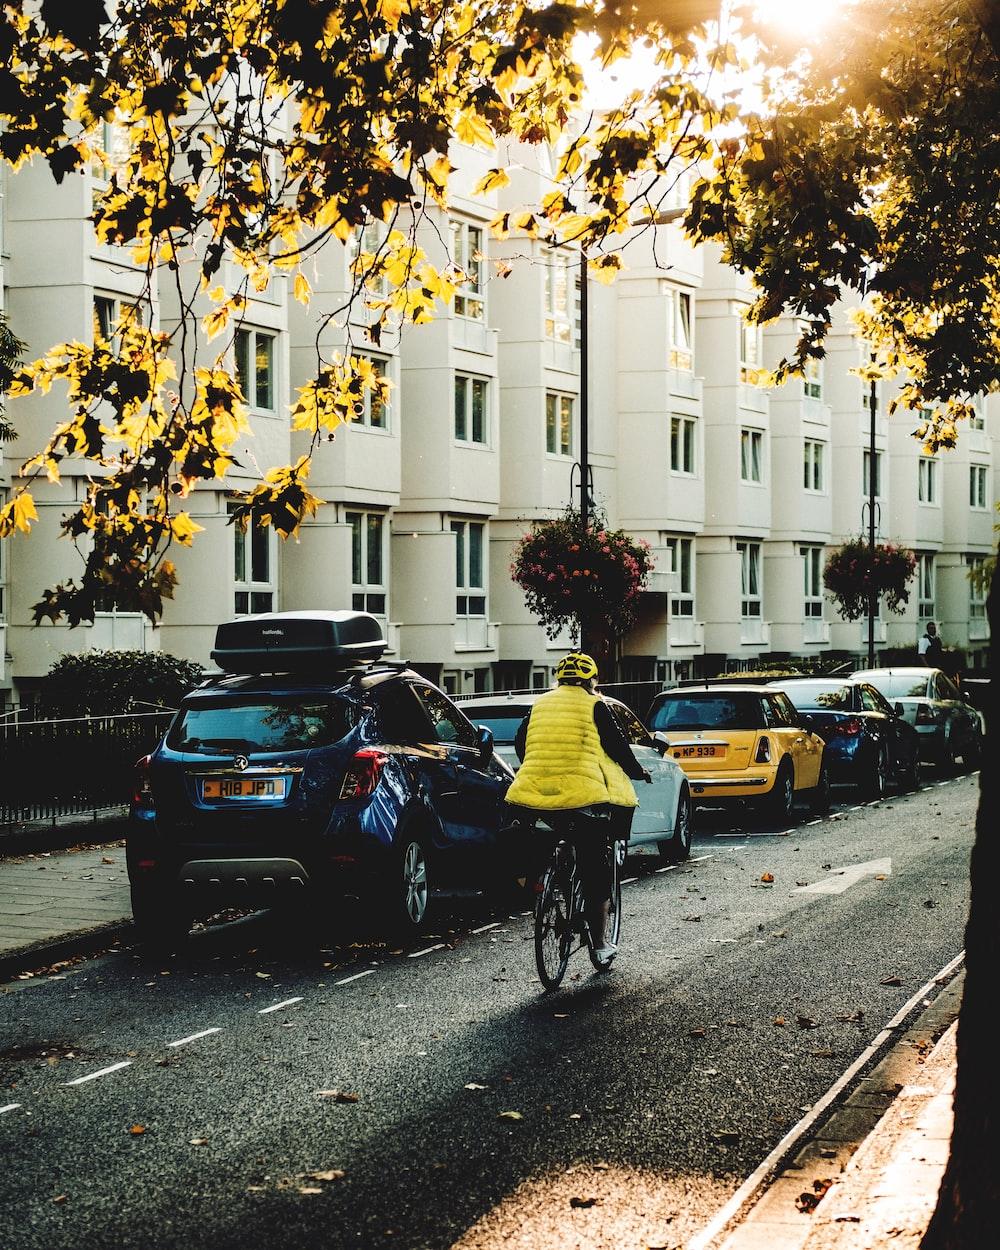 man riding on bike on sidewalkj